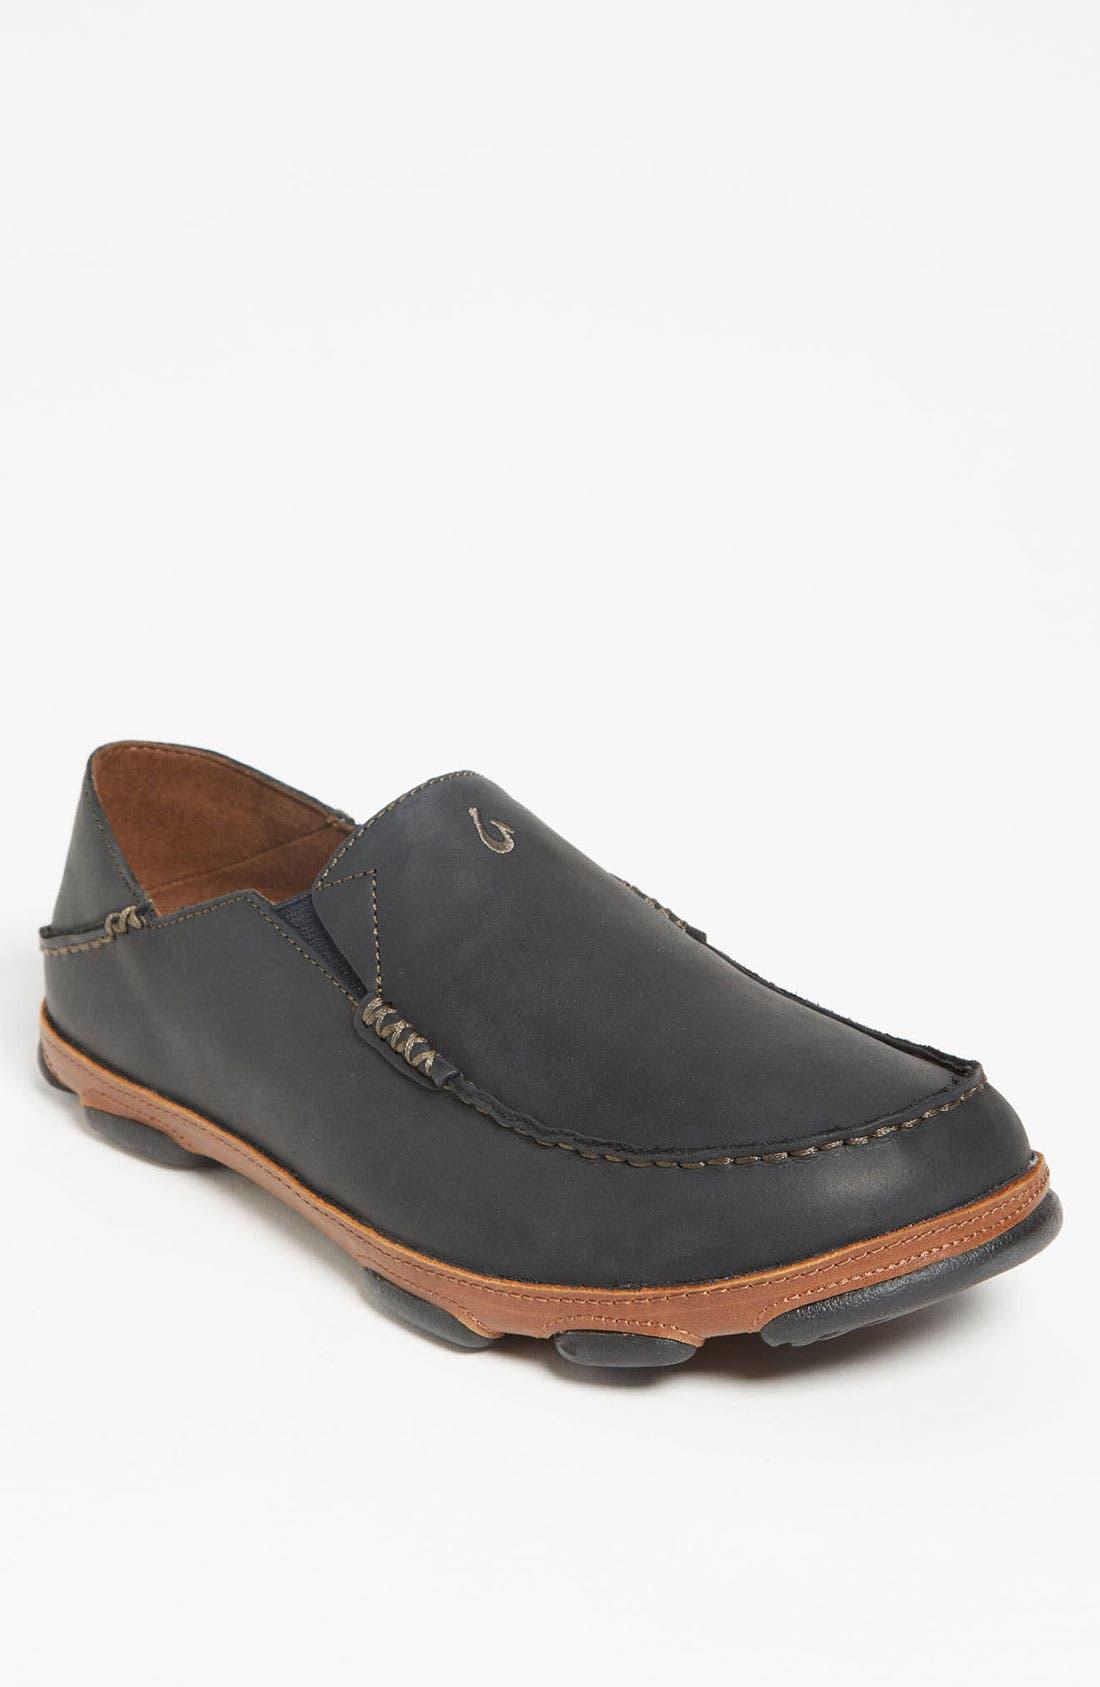 'Moloa' Slip-On,                             Main thumbnail 1, color,                             Black/ Toffee Leather